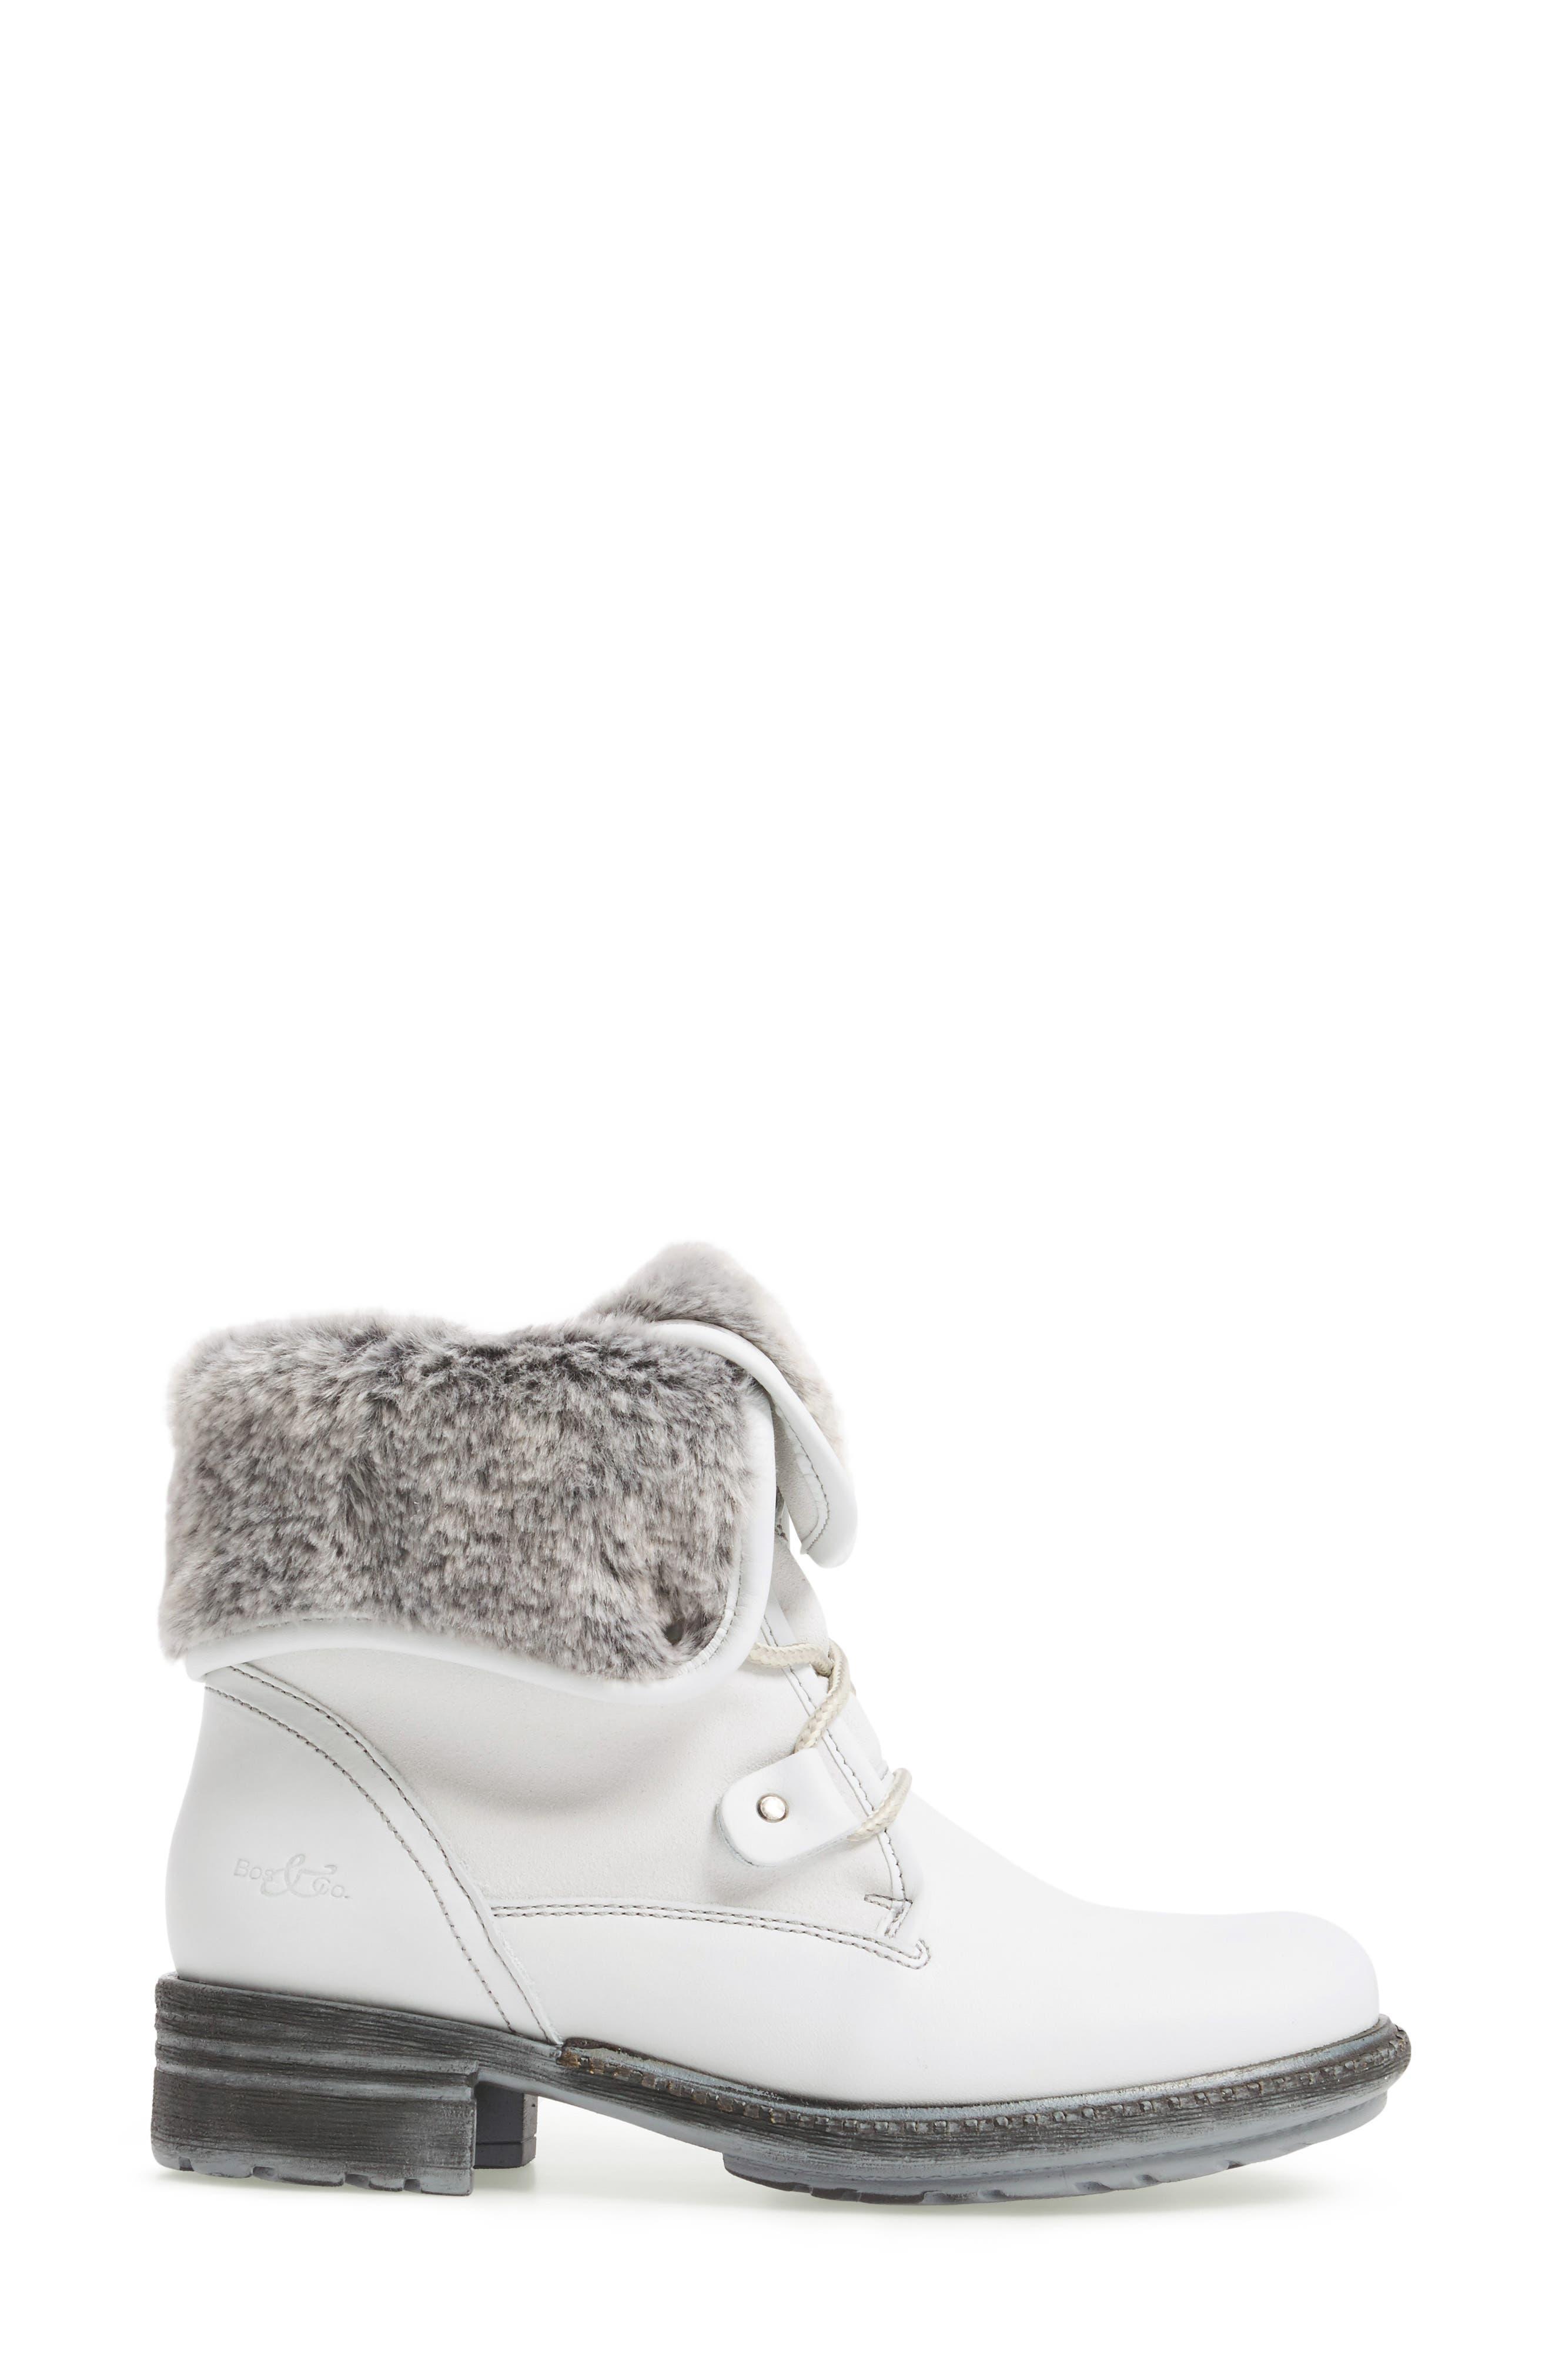 Springfield Waterproof Winter Boot,                             Alternate thumbnail 3, color,                             White/ Grey/ Black